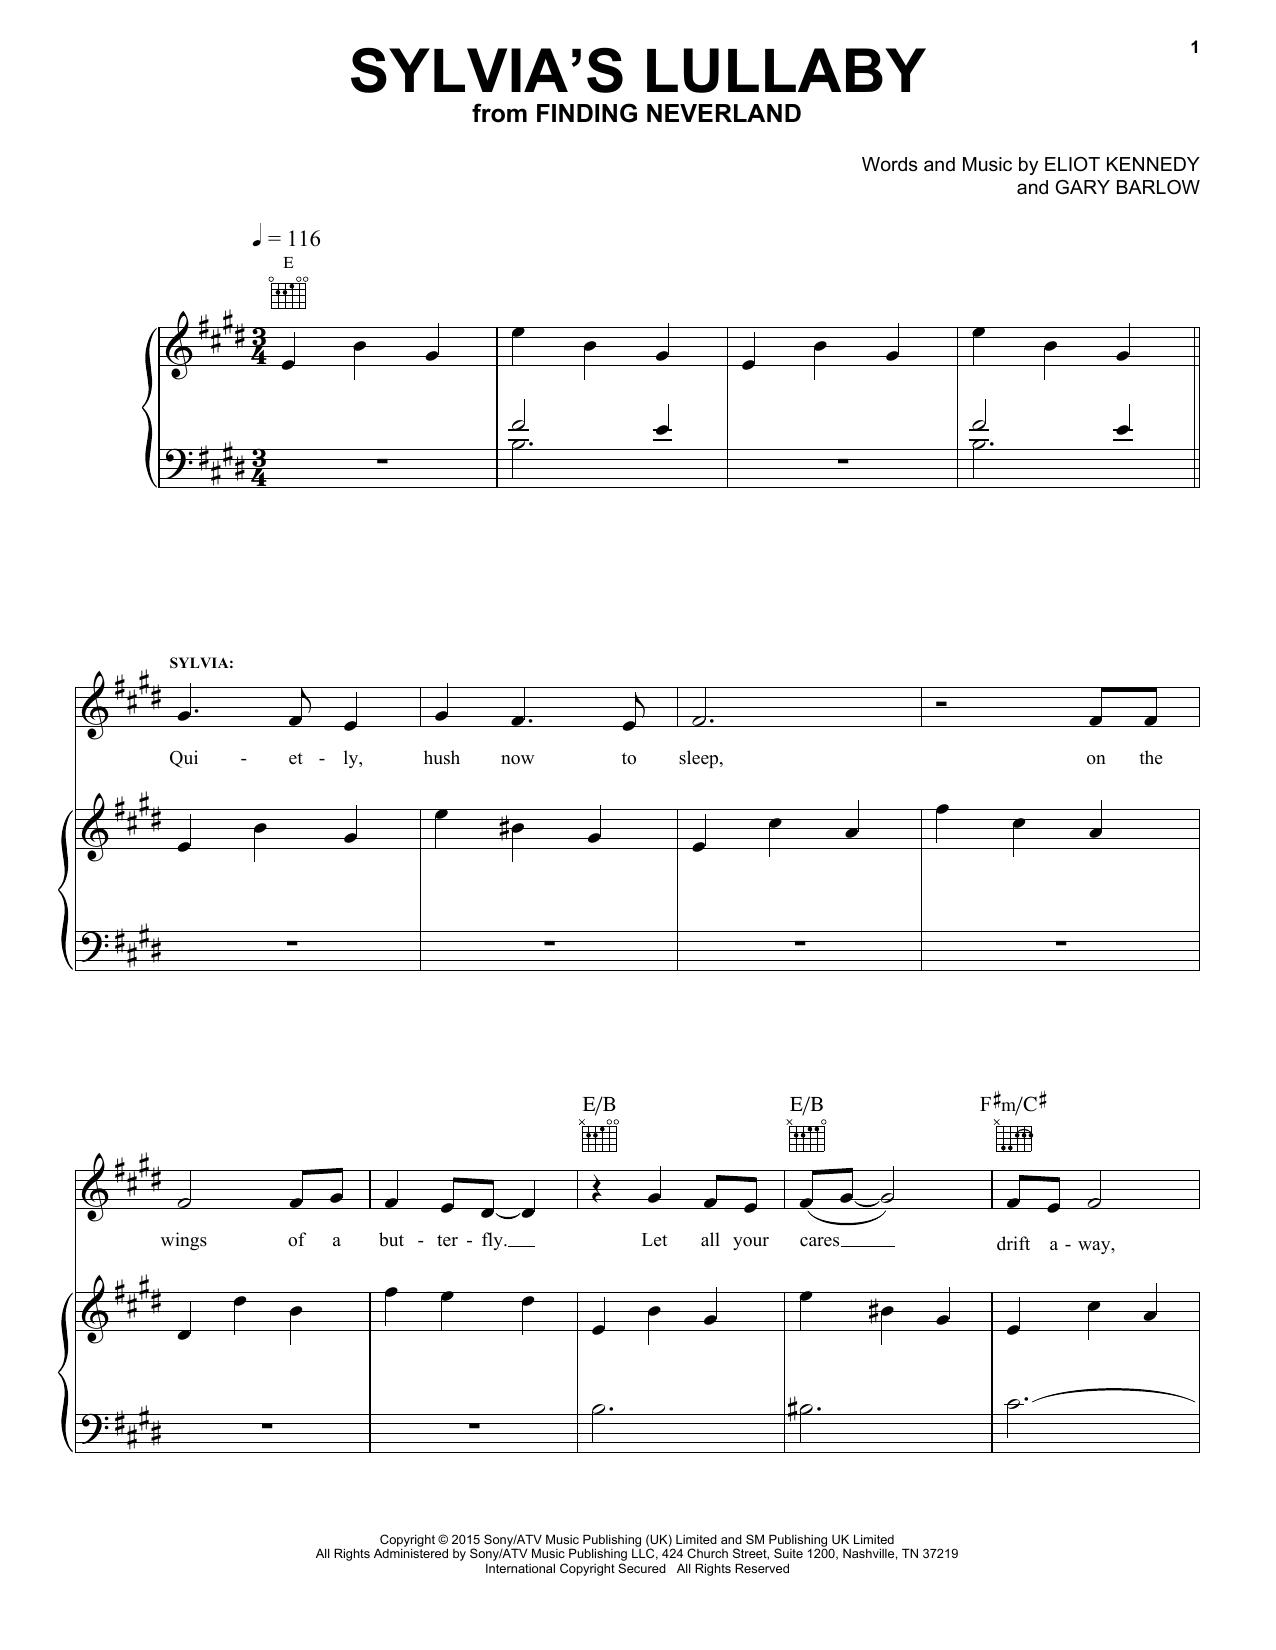 Sylvia's Lullaby sheet music